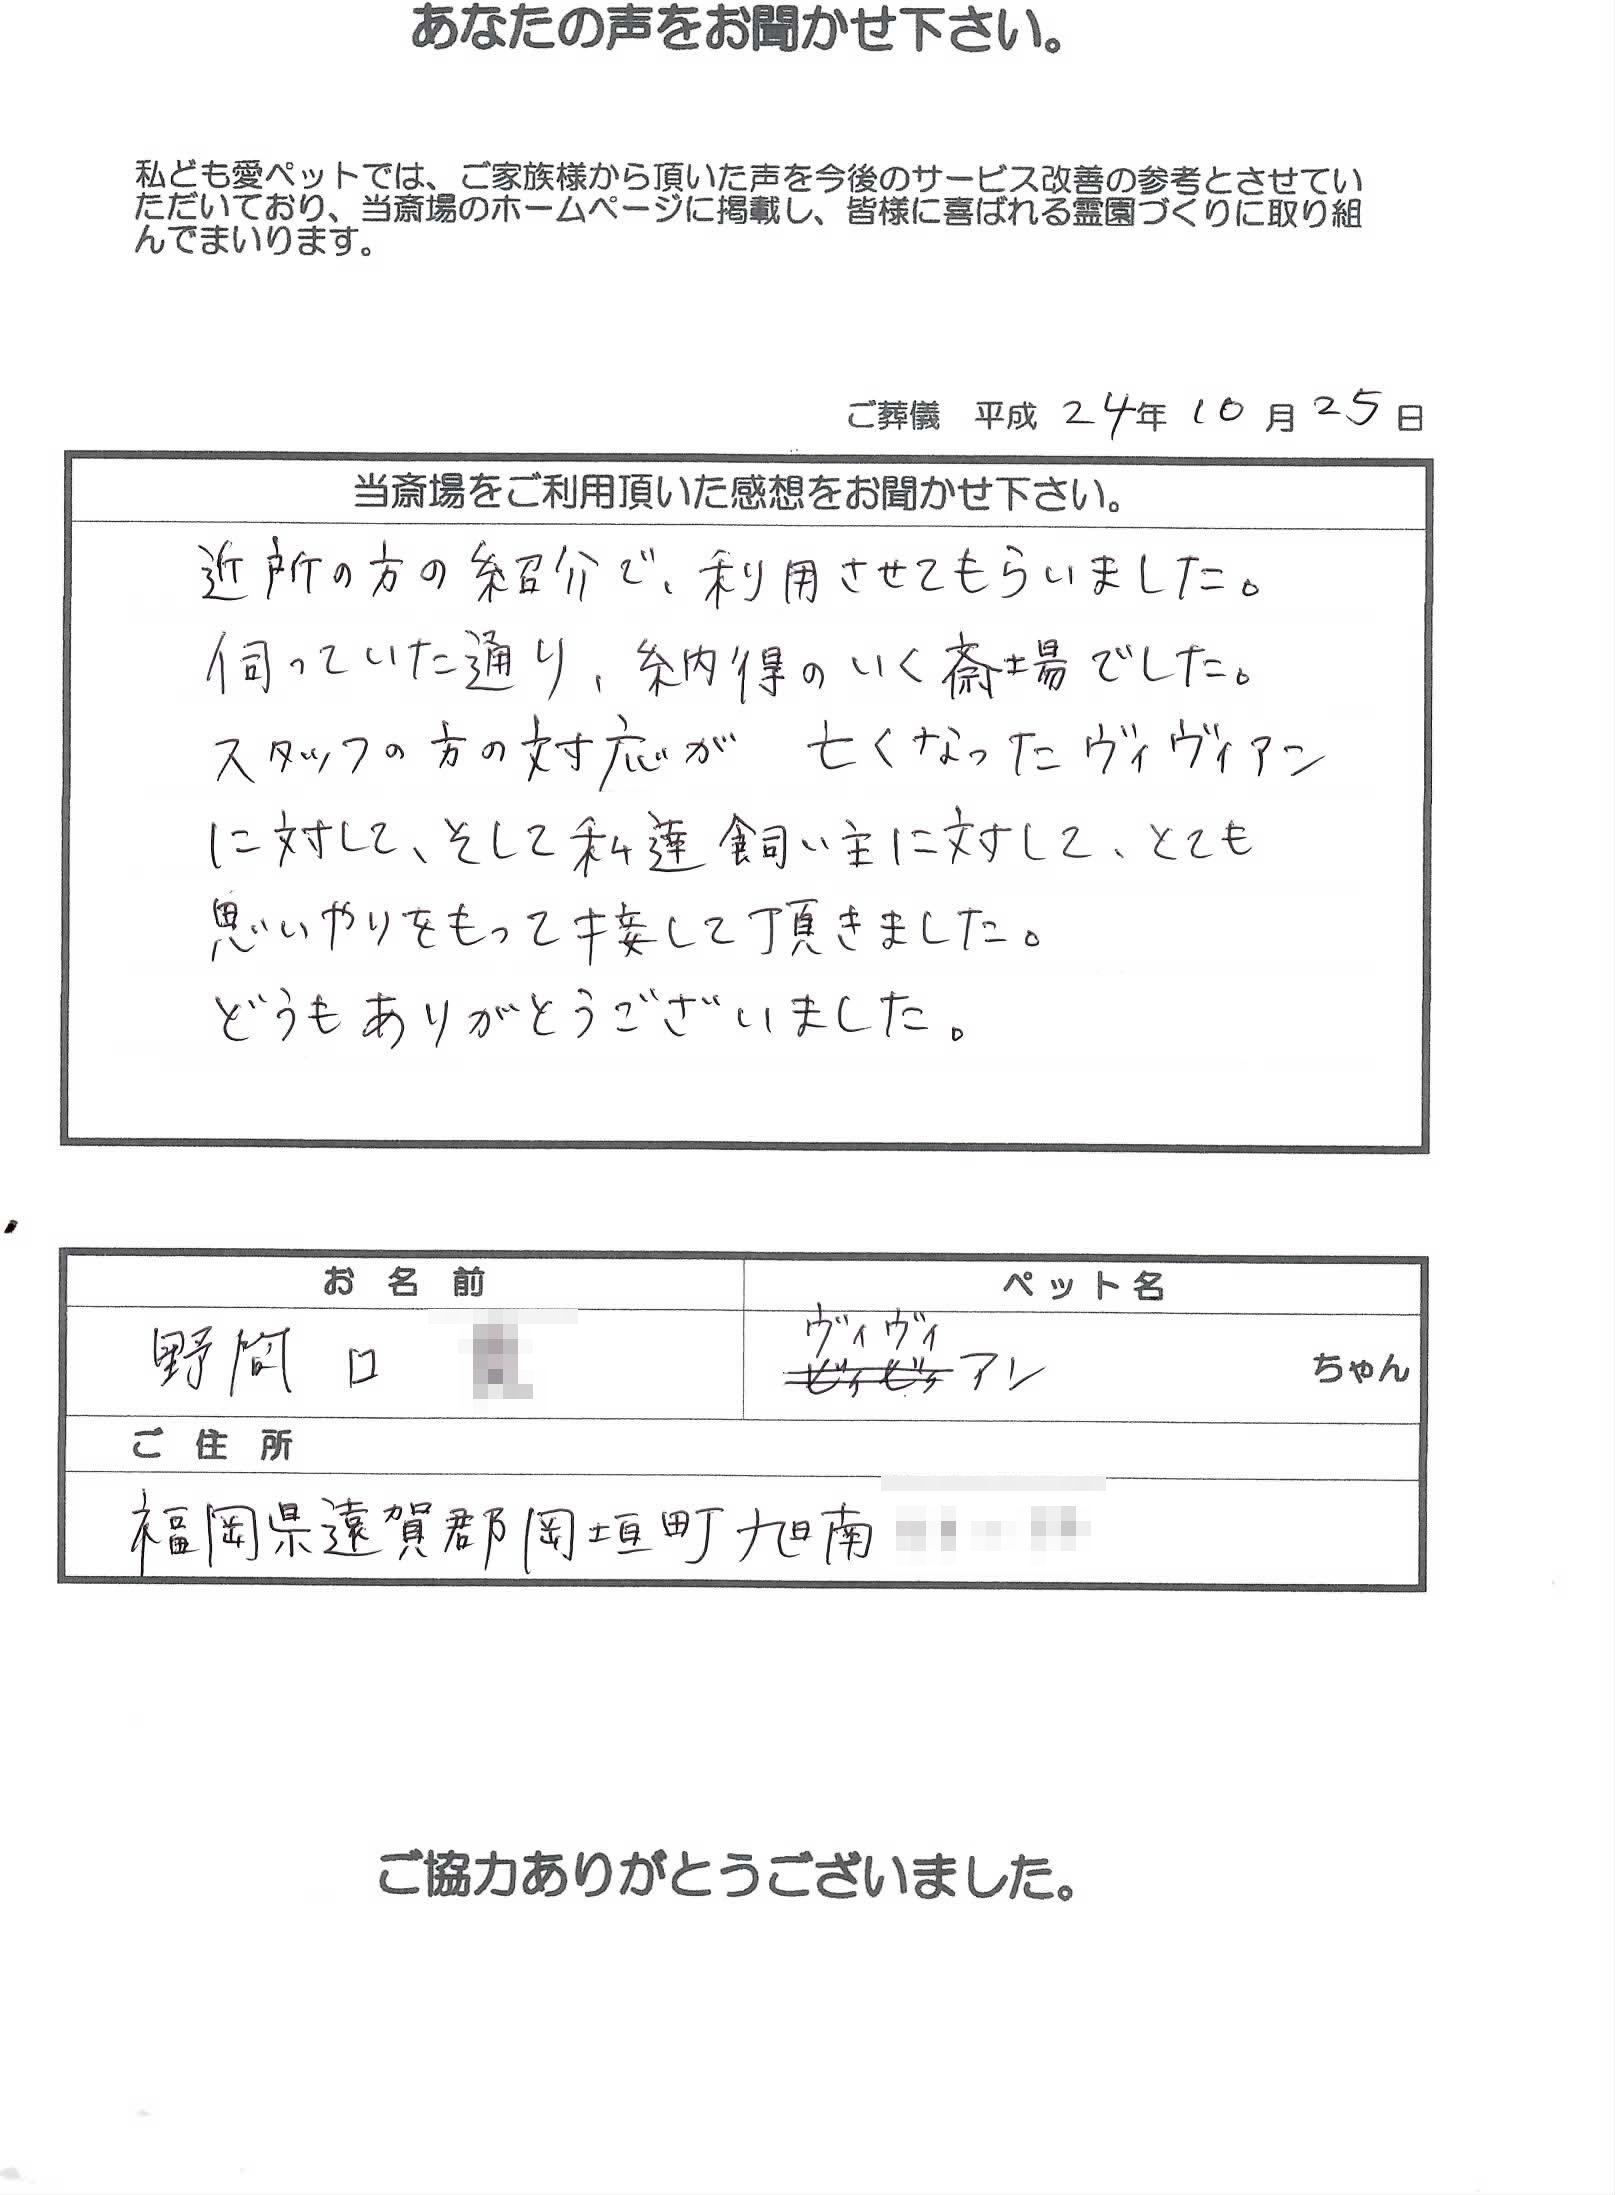 k121025-2.jpg